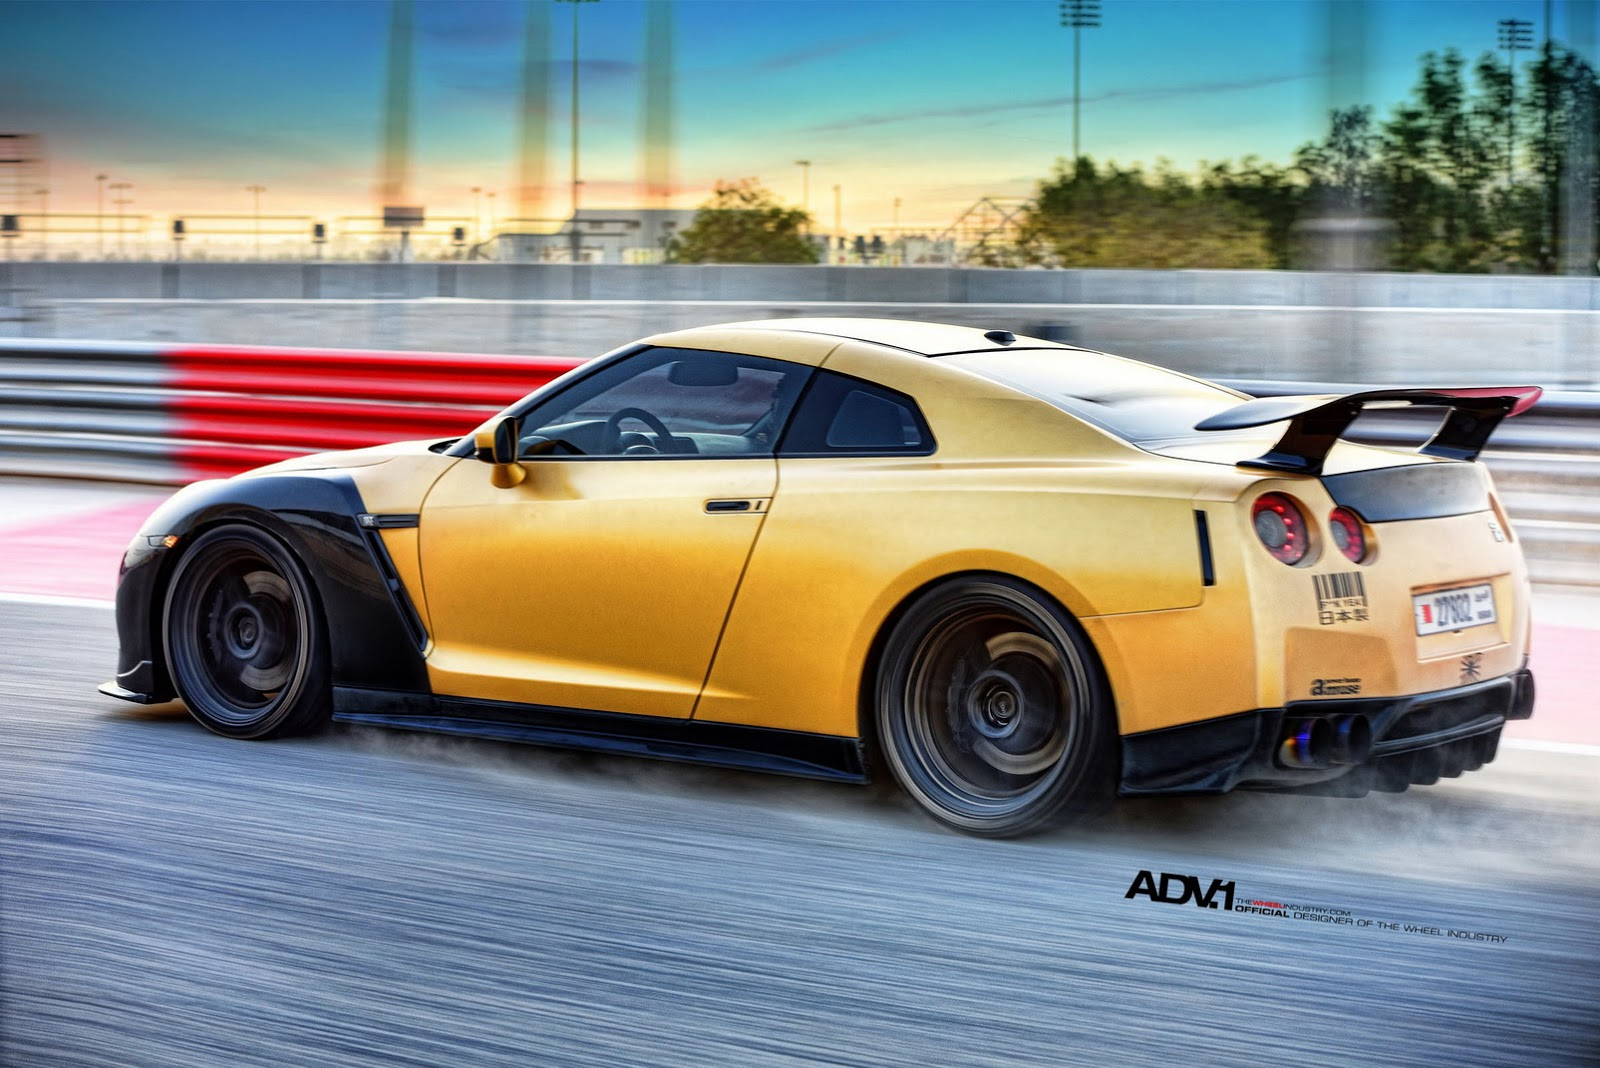 Gold Carbon Ams Nissan Gt R With Adv1 Wheels Gtspirit Rims Gtr 1